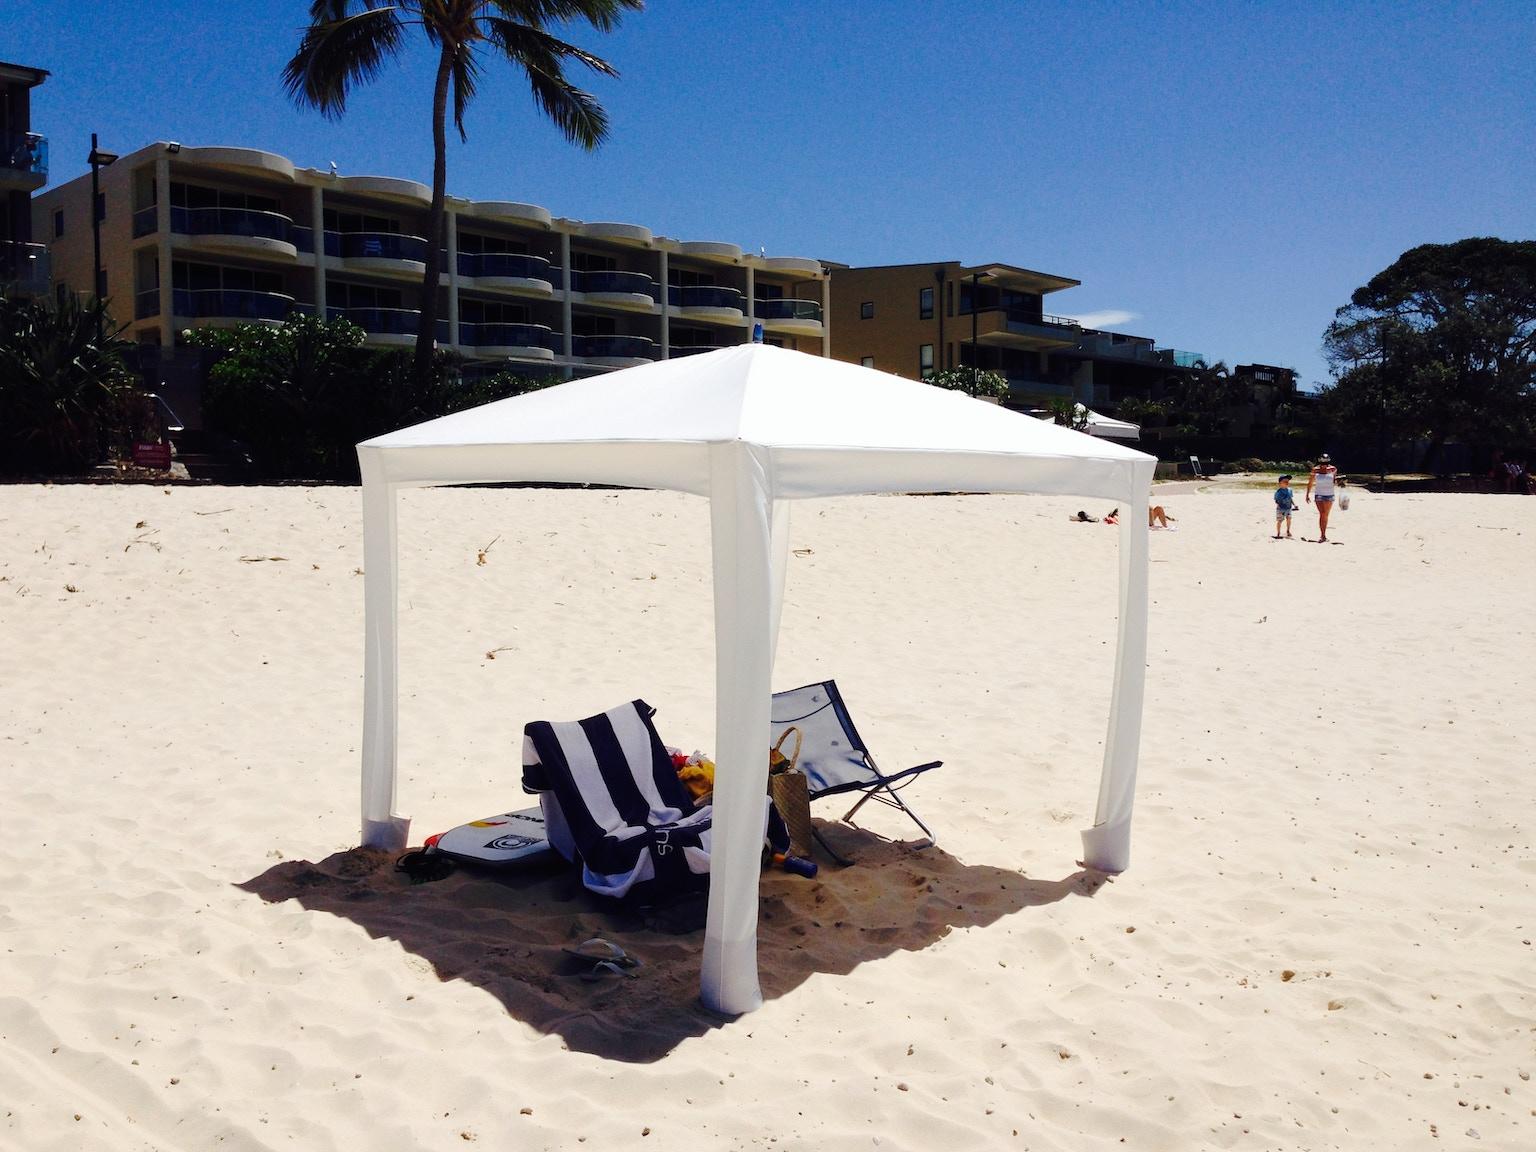 Cool Cabanas The World S Best Sun Shelter By Mark Fraser